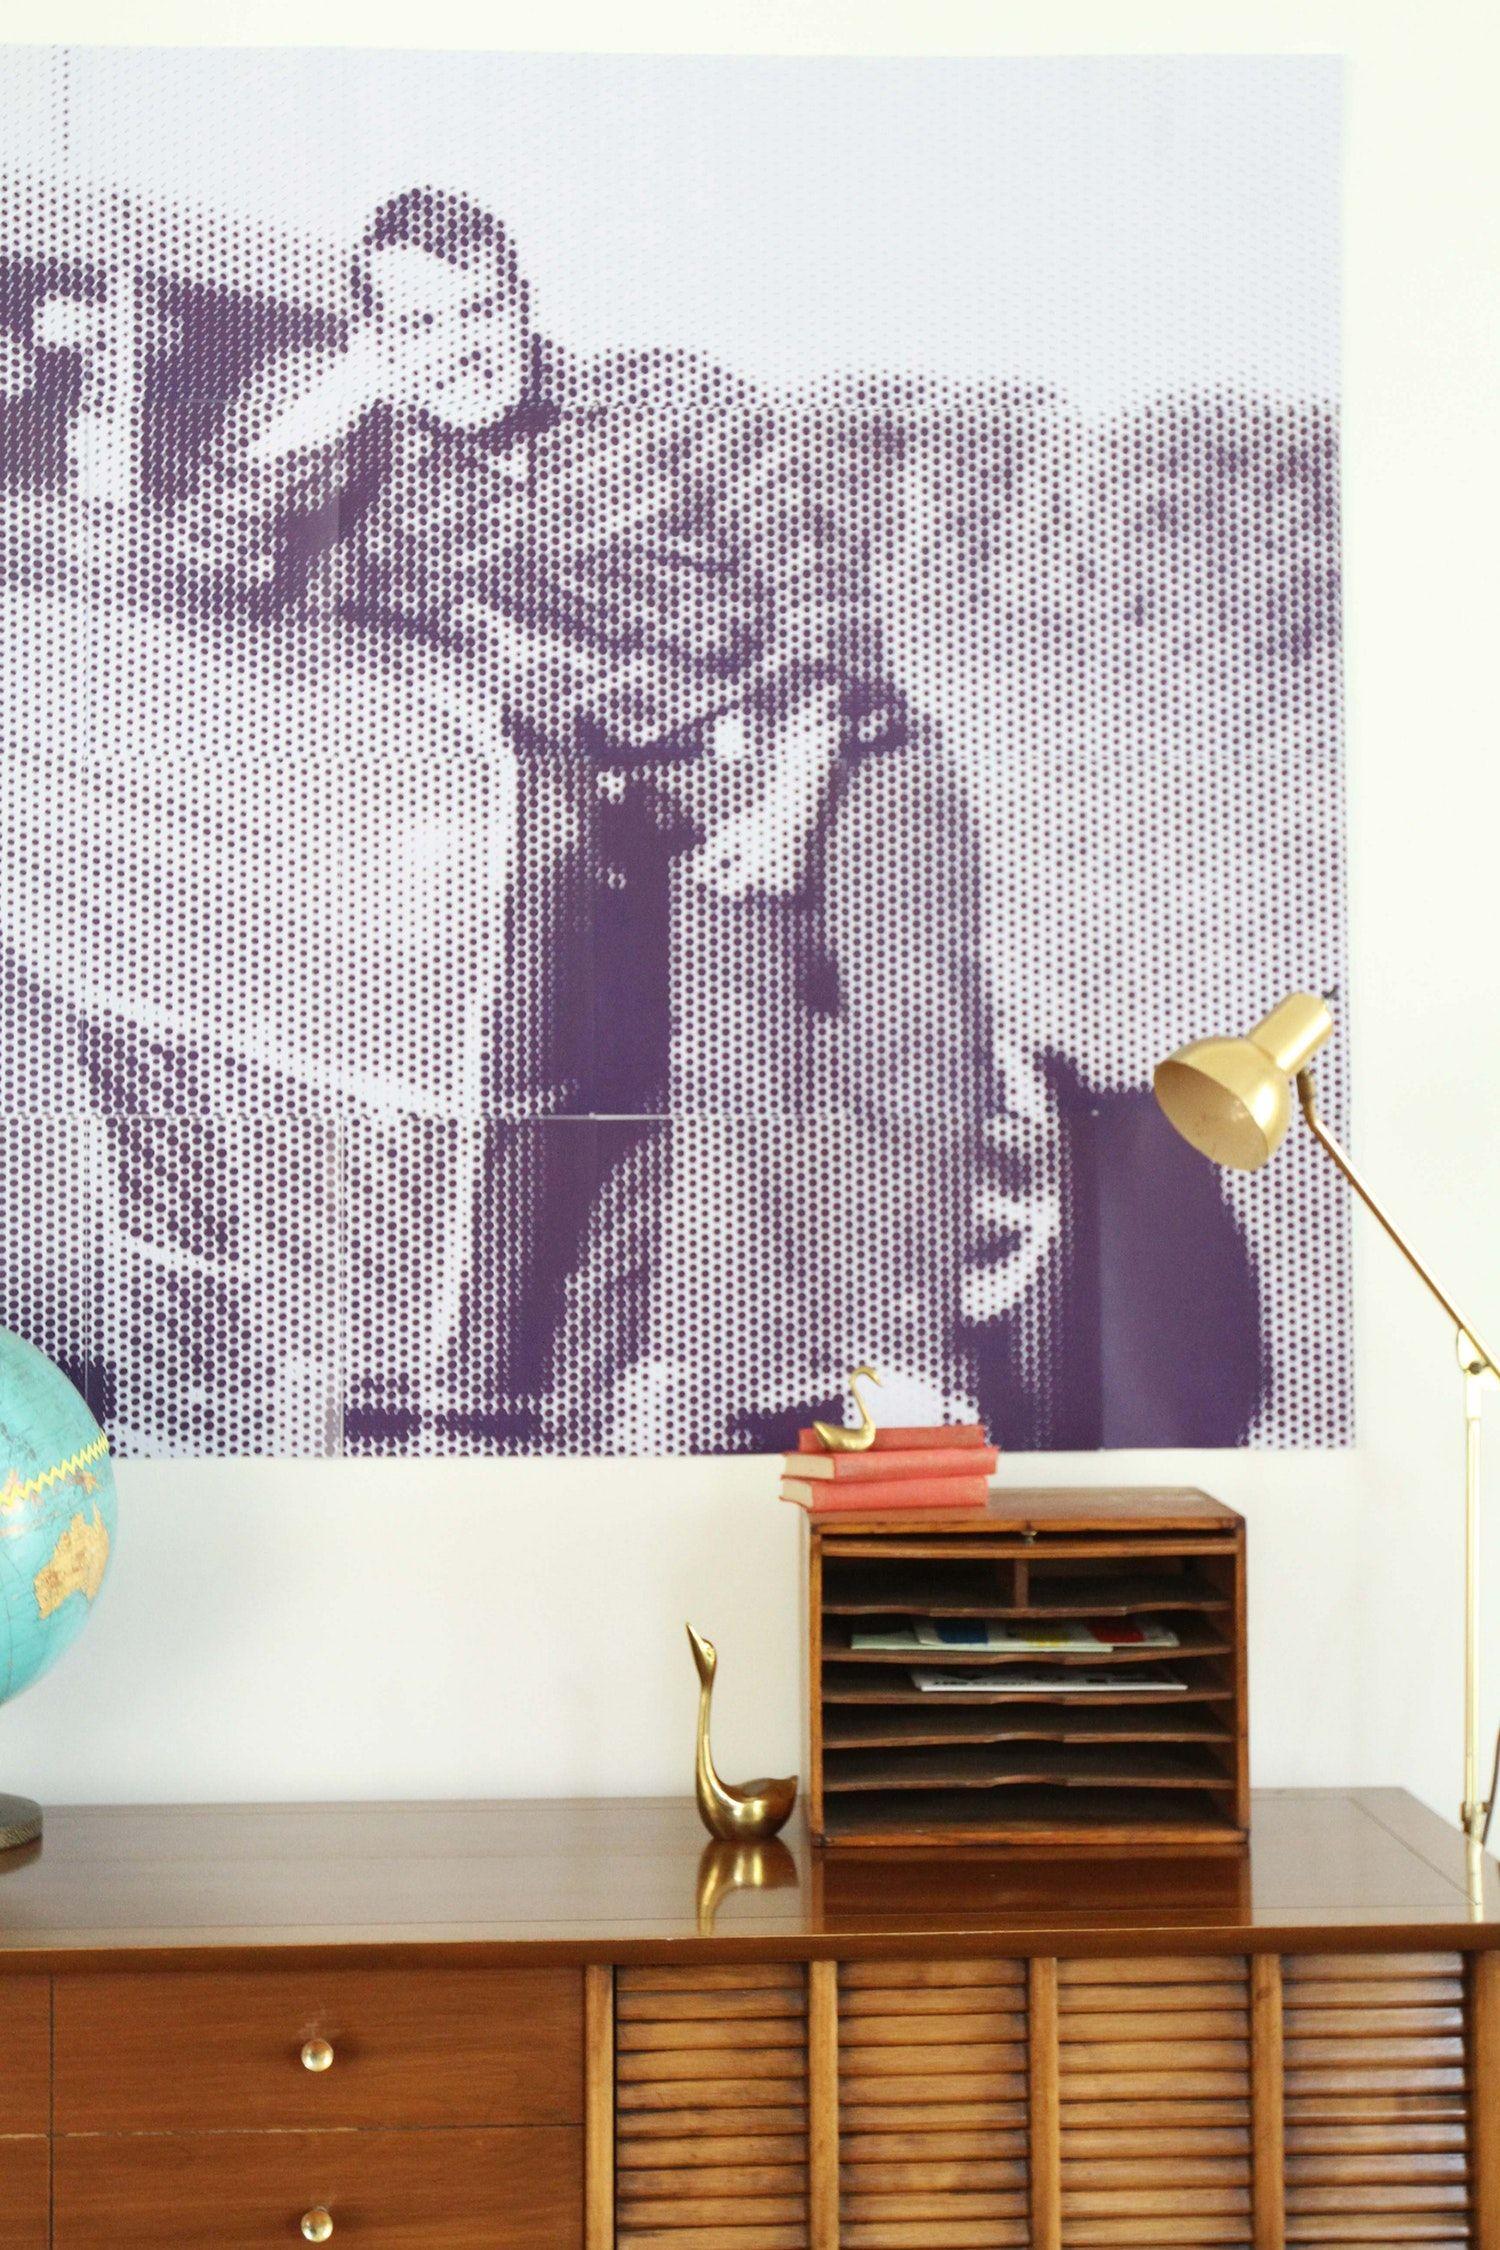 How To Use The Rasterbator To Create Large Scale Wall Art Diy